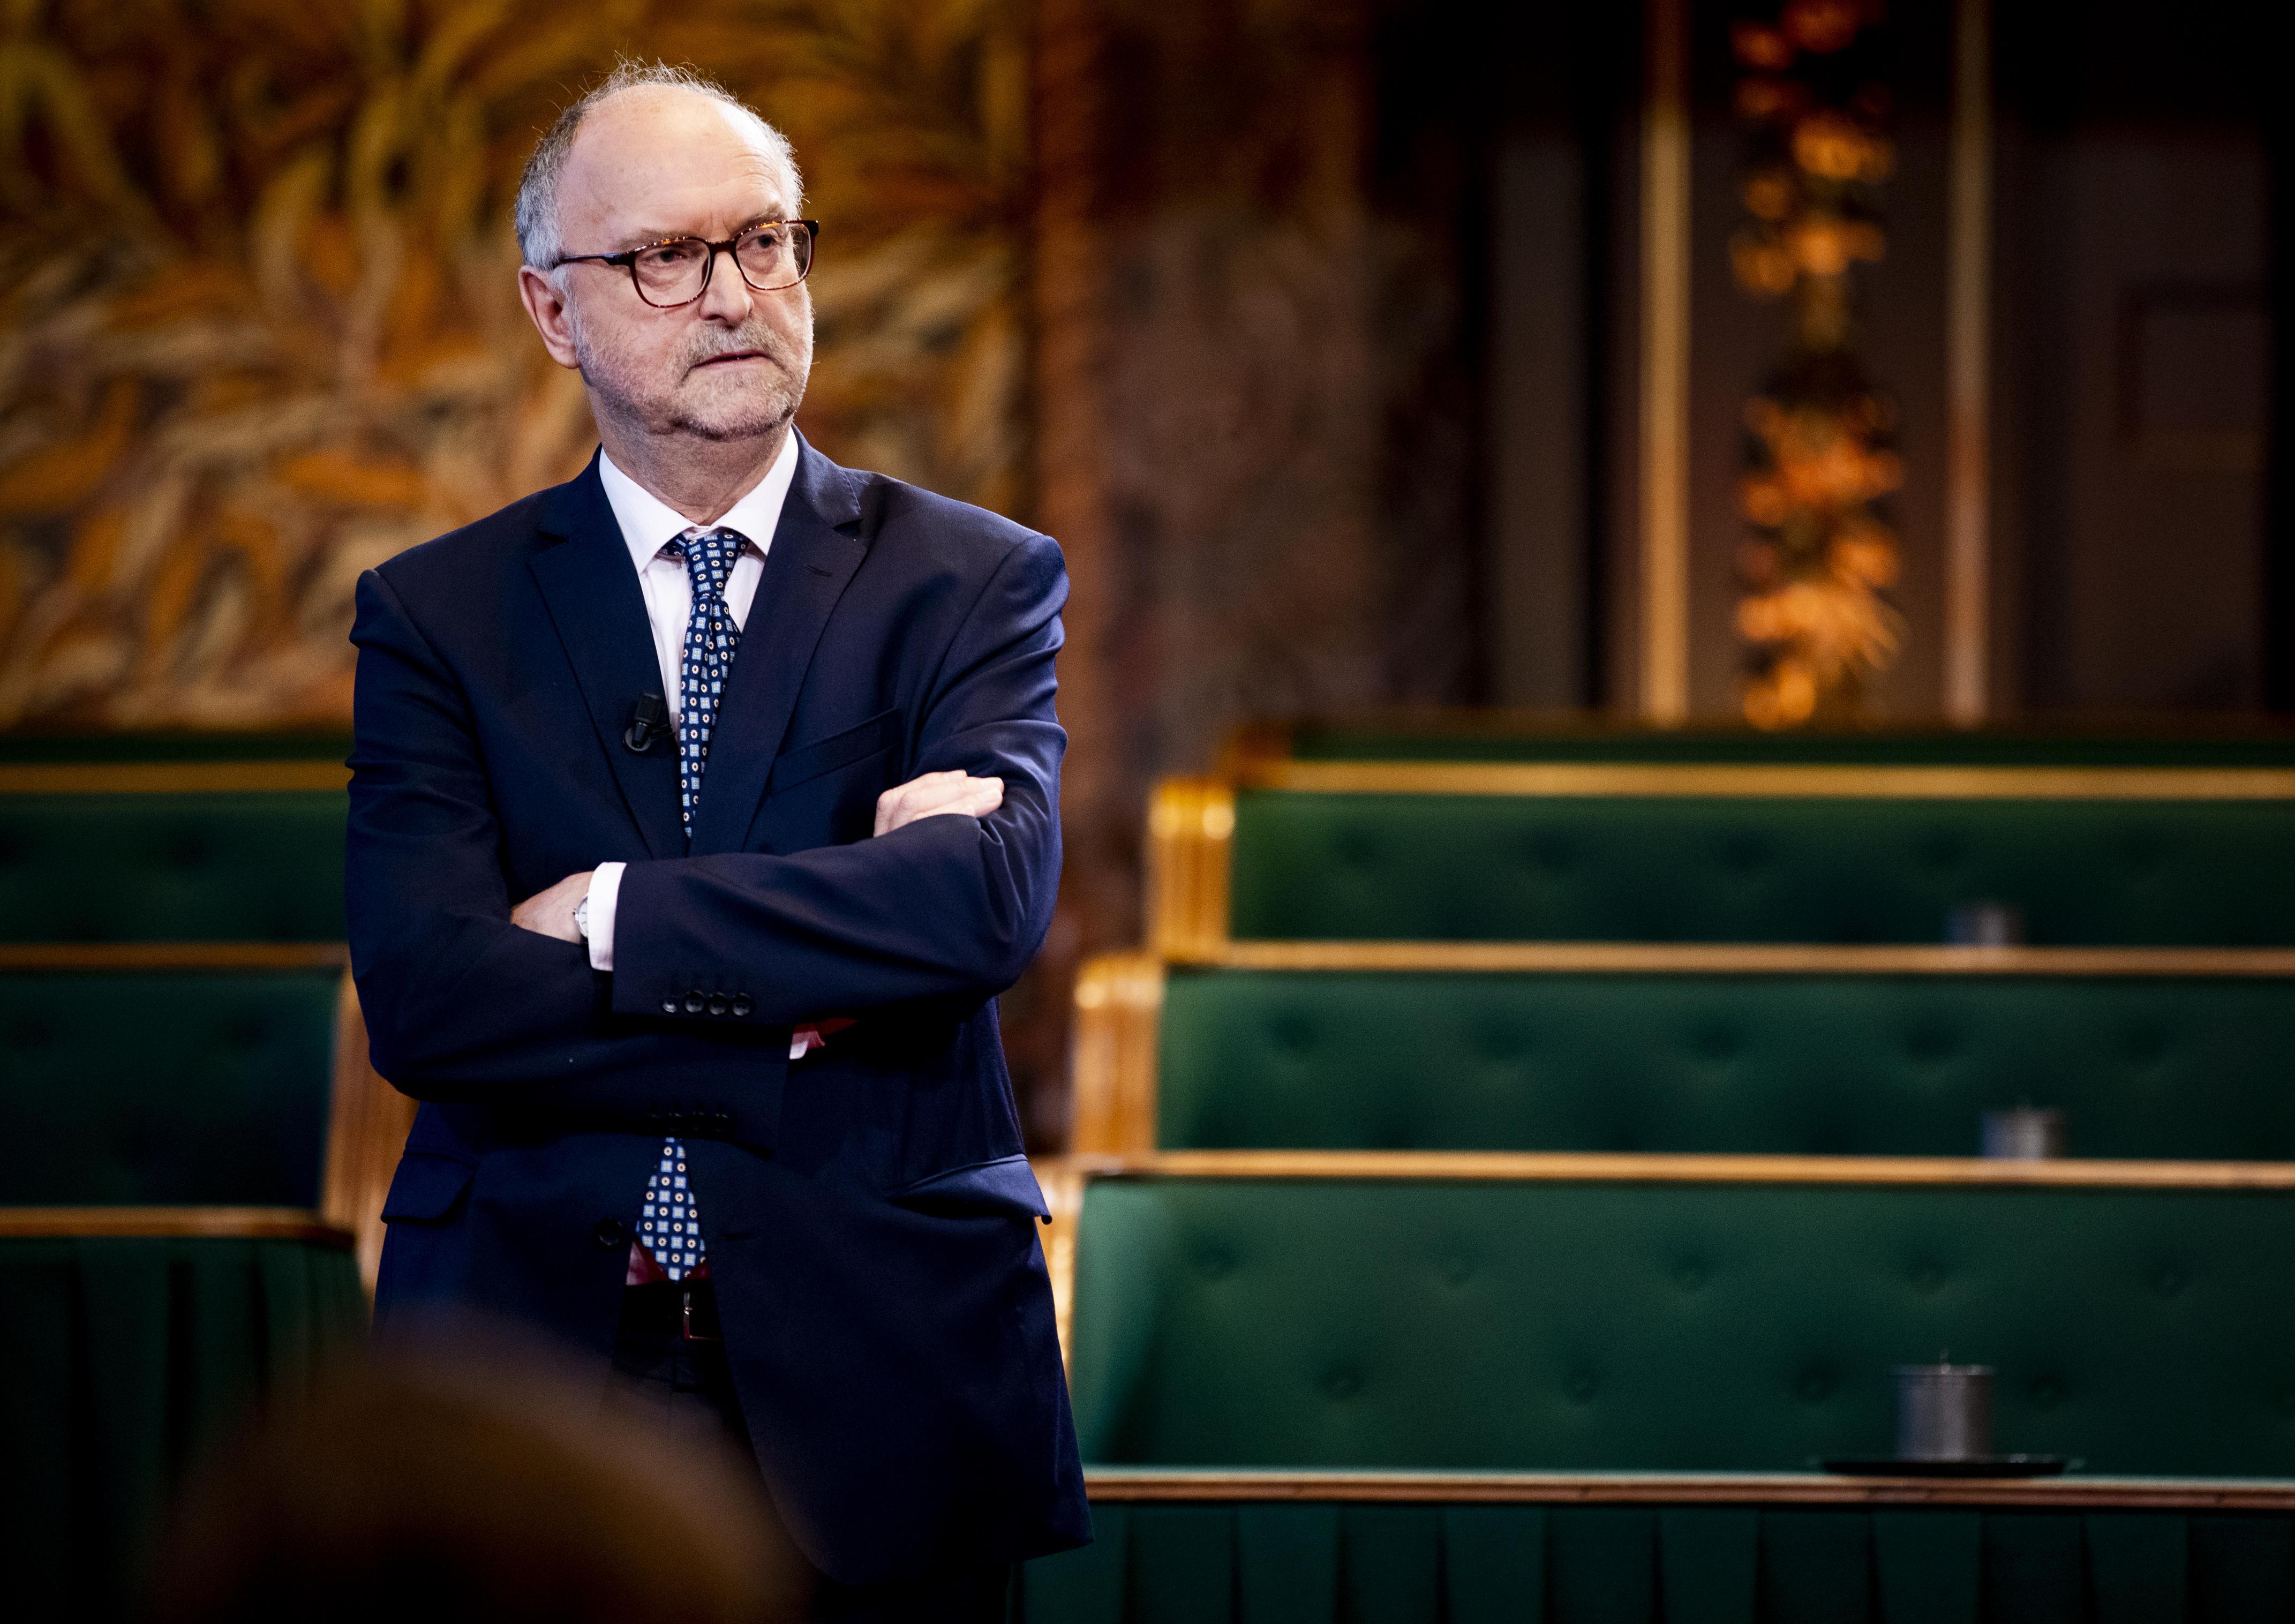 Leidse hoogleraar Paul Cliteur gaat FVD toch wel leiden in de Eerste Kamer